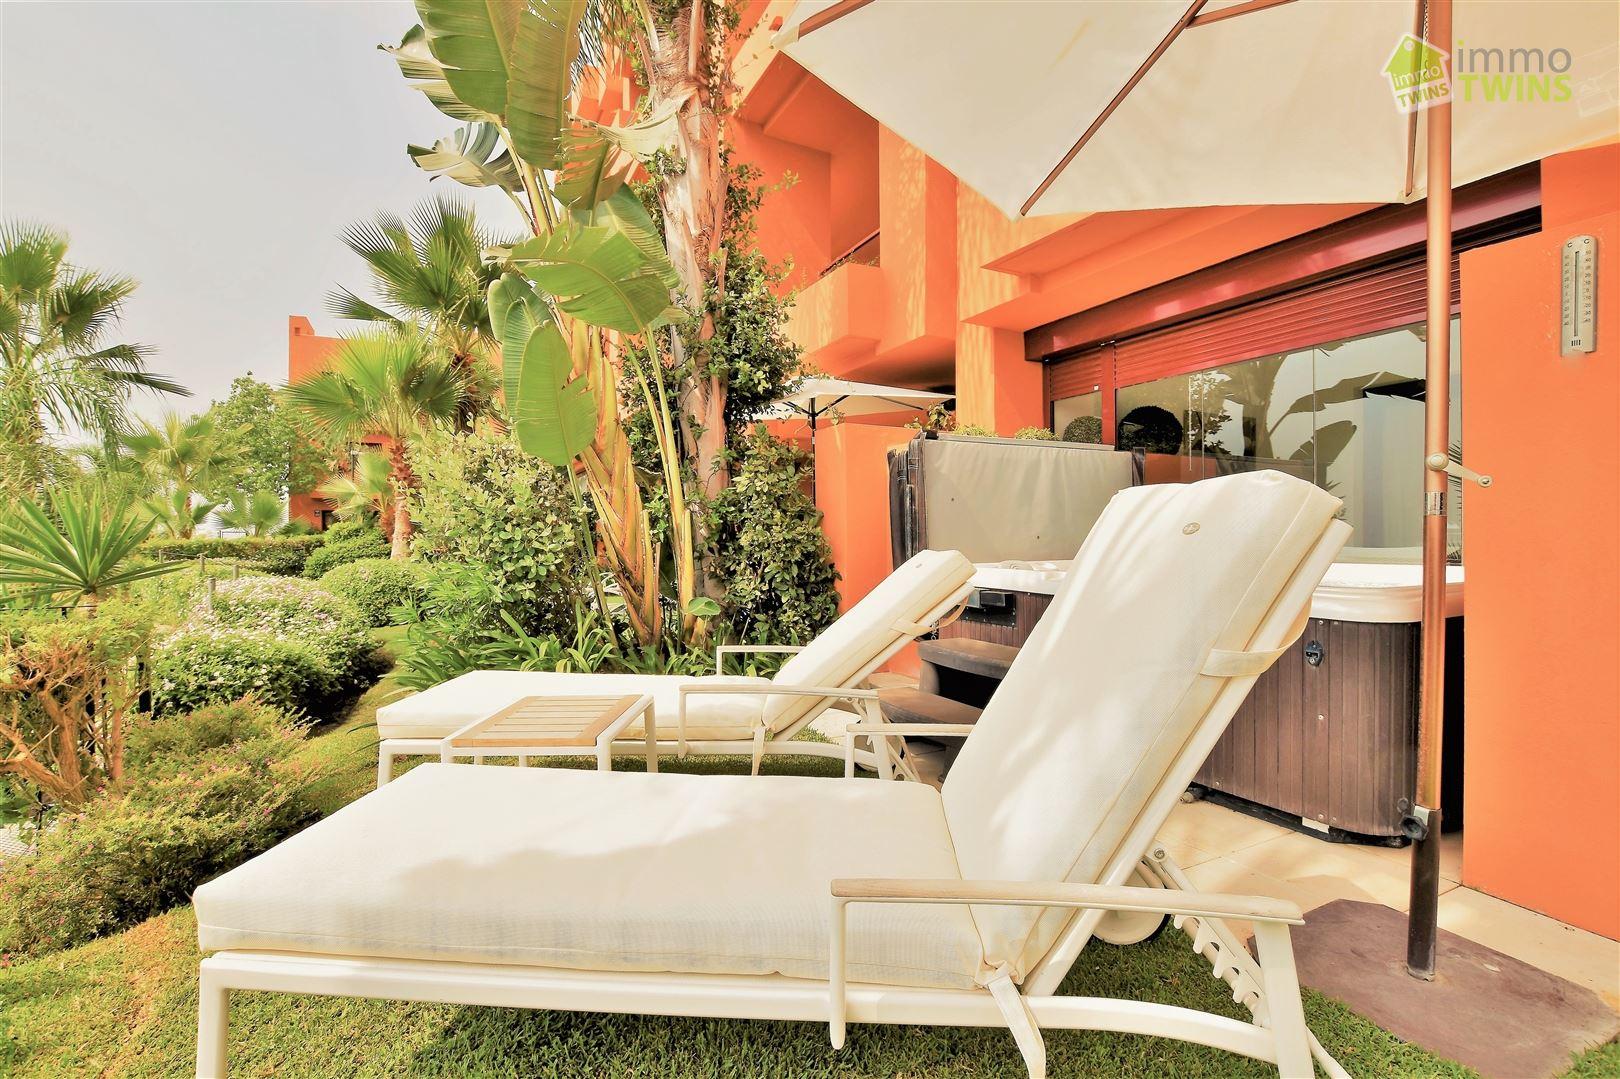 Foto 9 : Appartement te 29679 MARBELLA (Spanje) - Prijs € 485.000